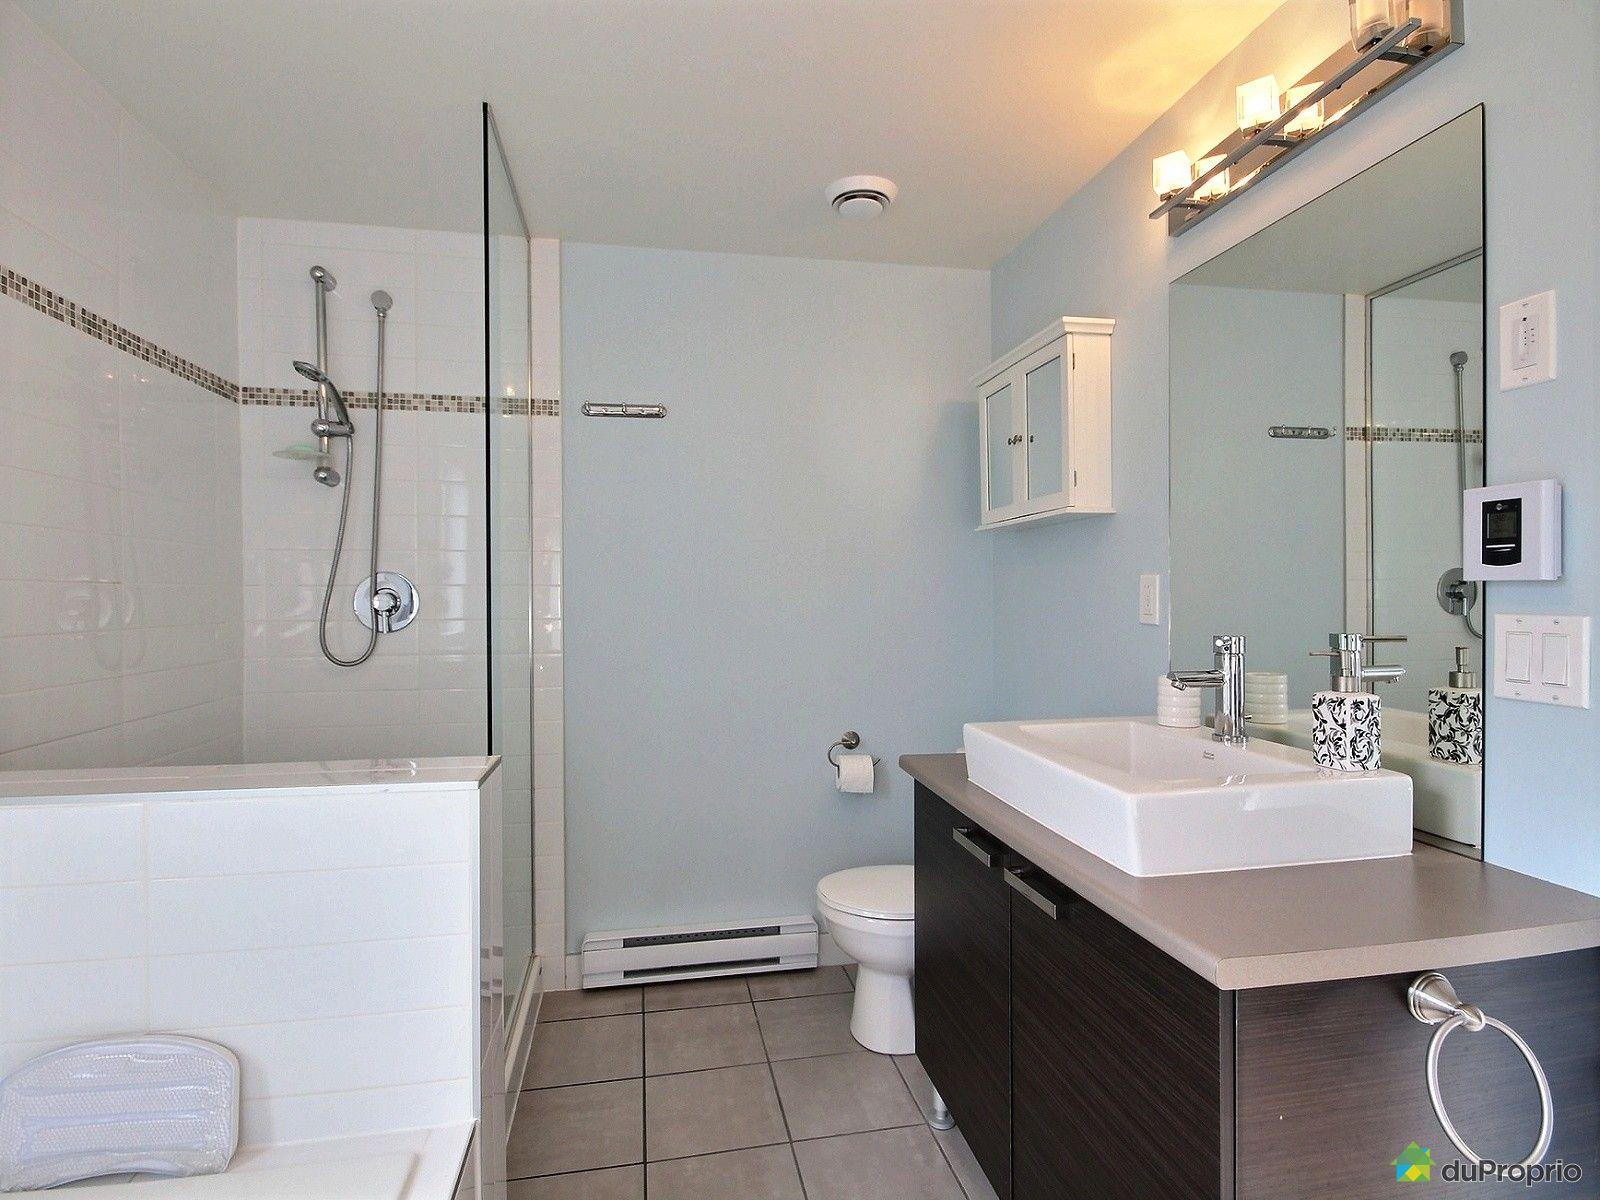 condo vendre montr al 5401 rue gabri le frascadore. Black Bedroom Furniture Sets. Home Design Ideas